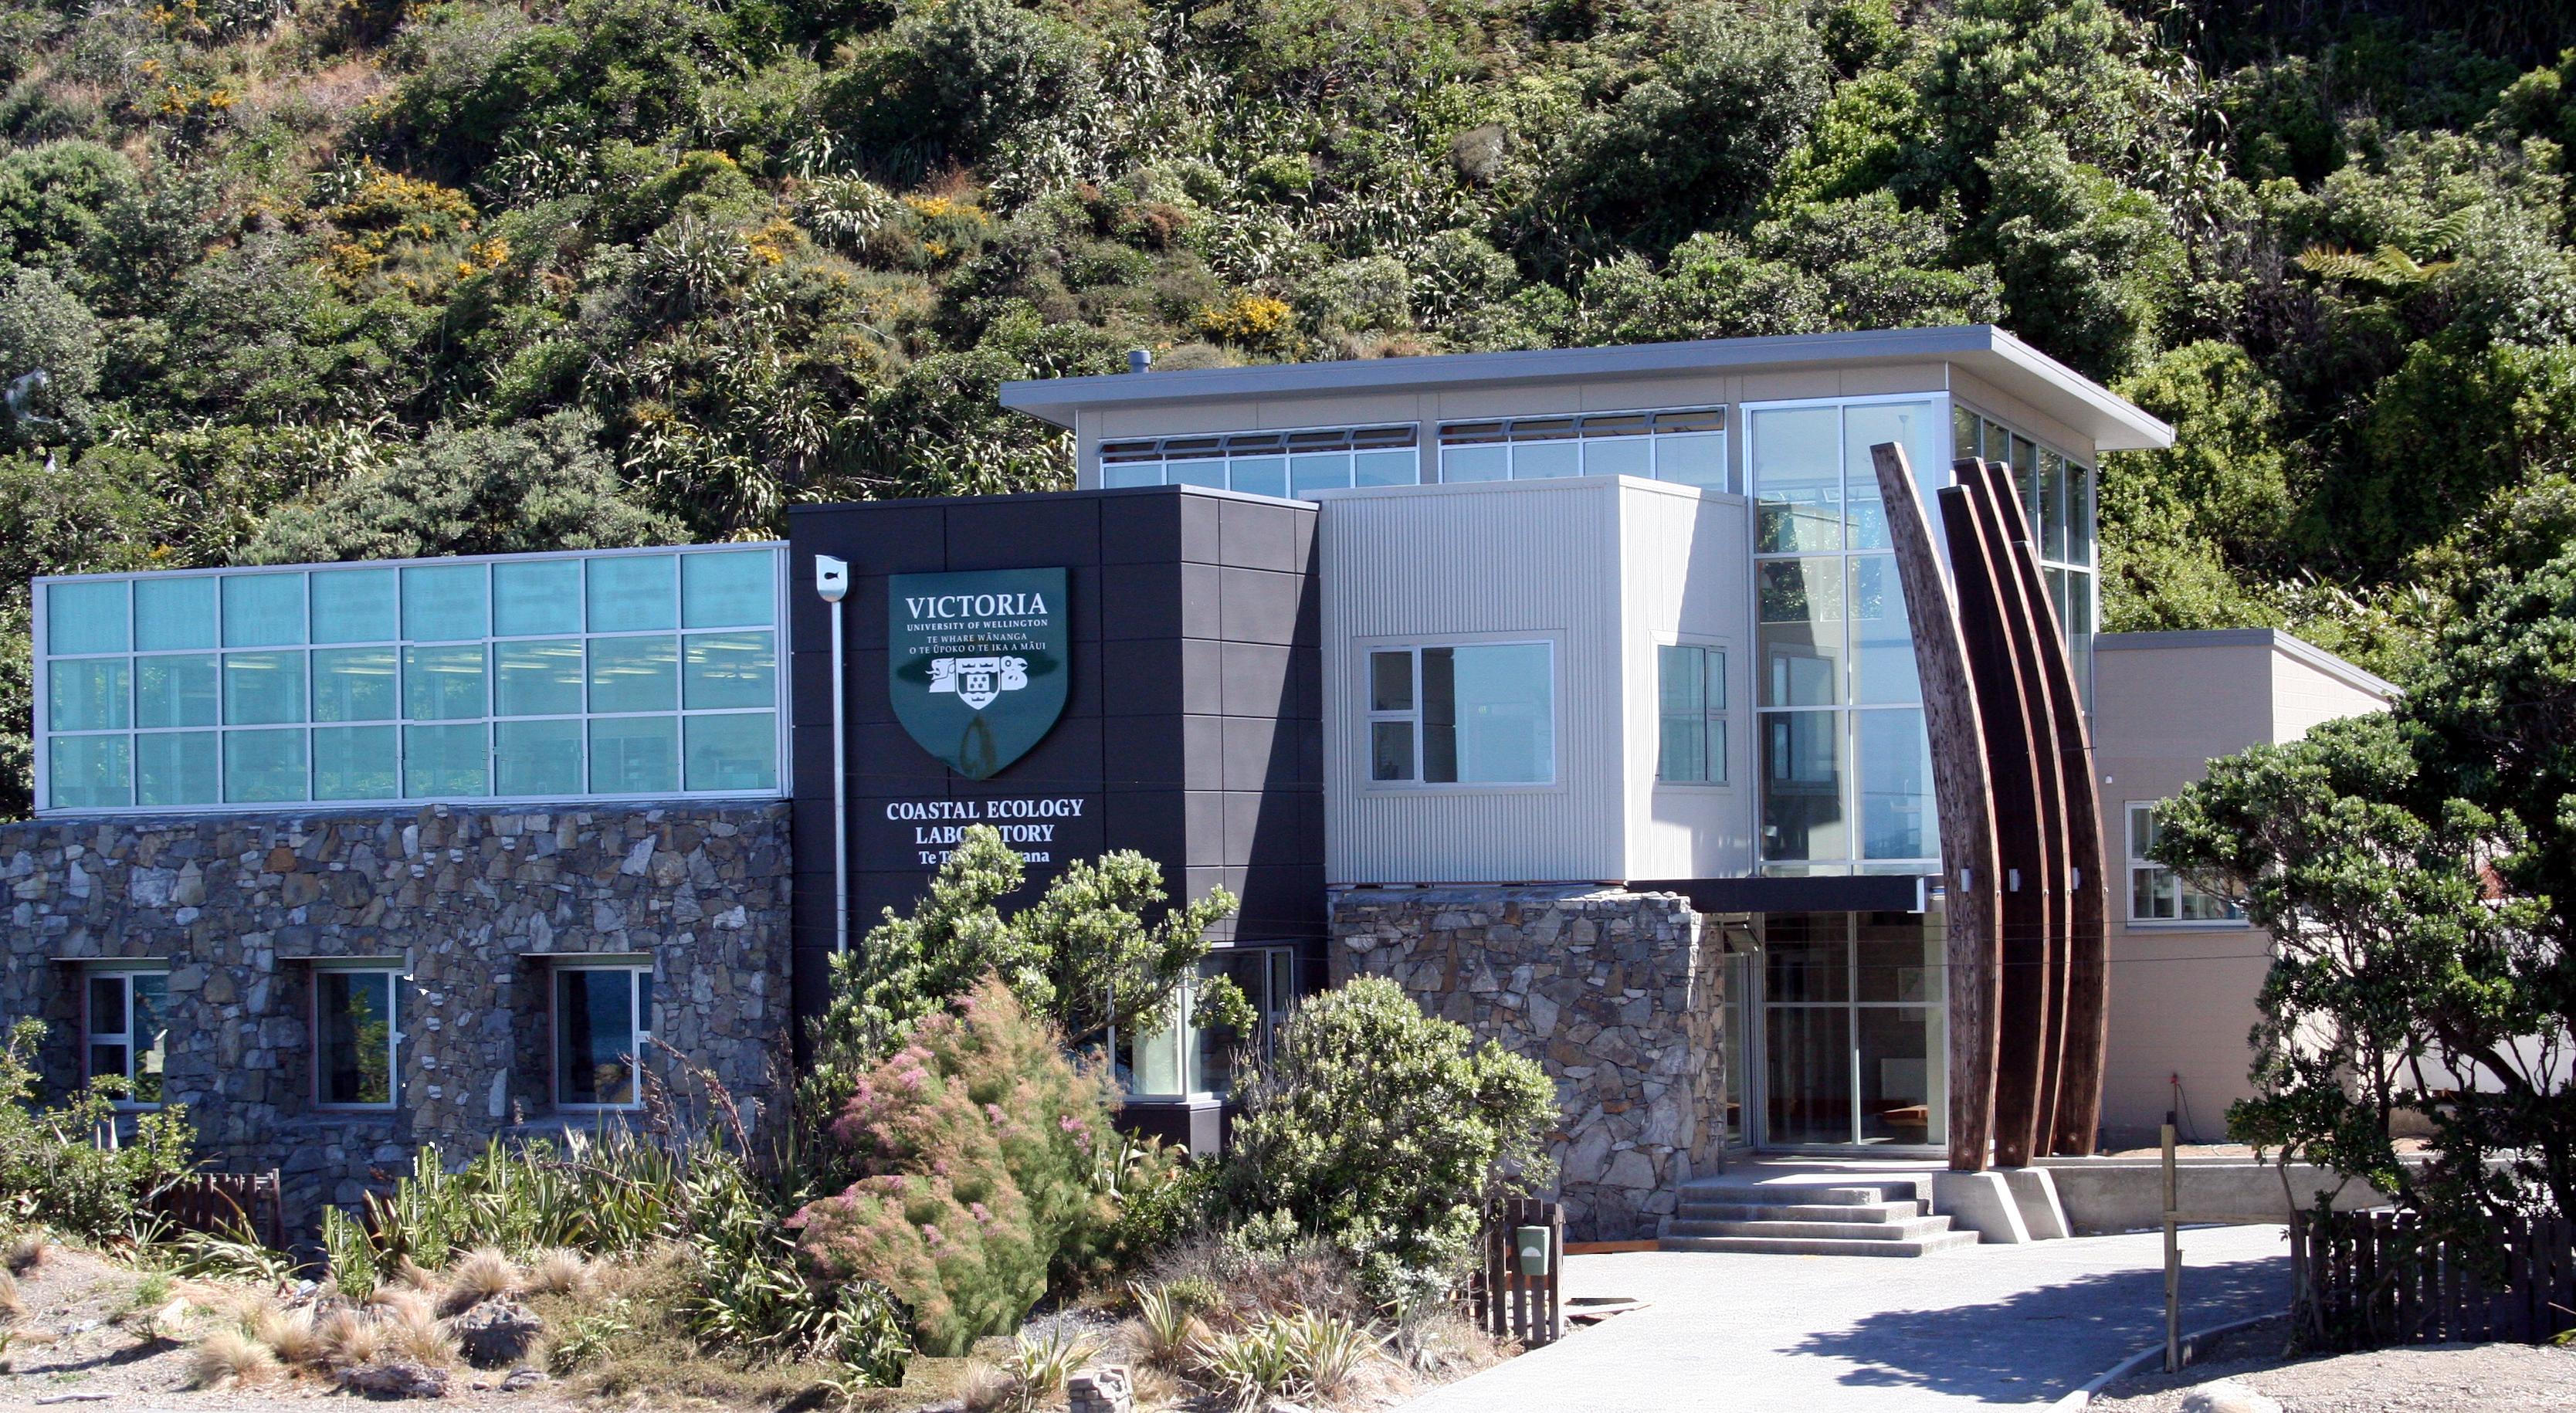 Victoria University Coastal Ecology Laboratory Wikipedia